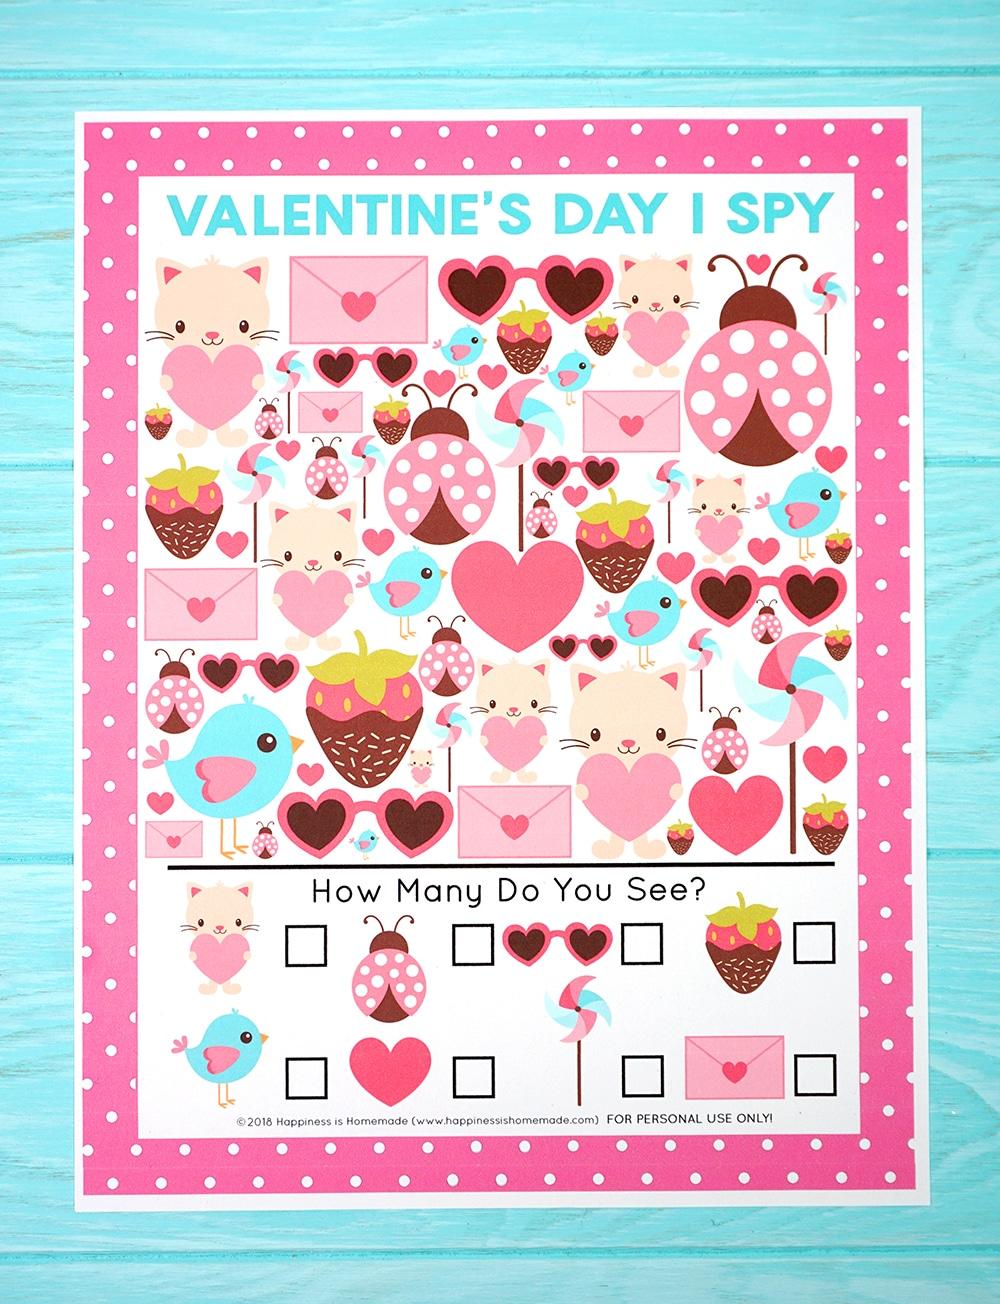 Valentine's Day I Spy Game on blue wood background